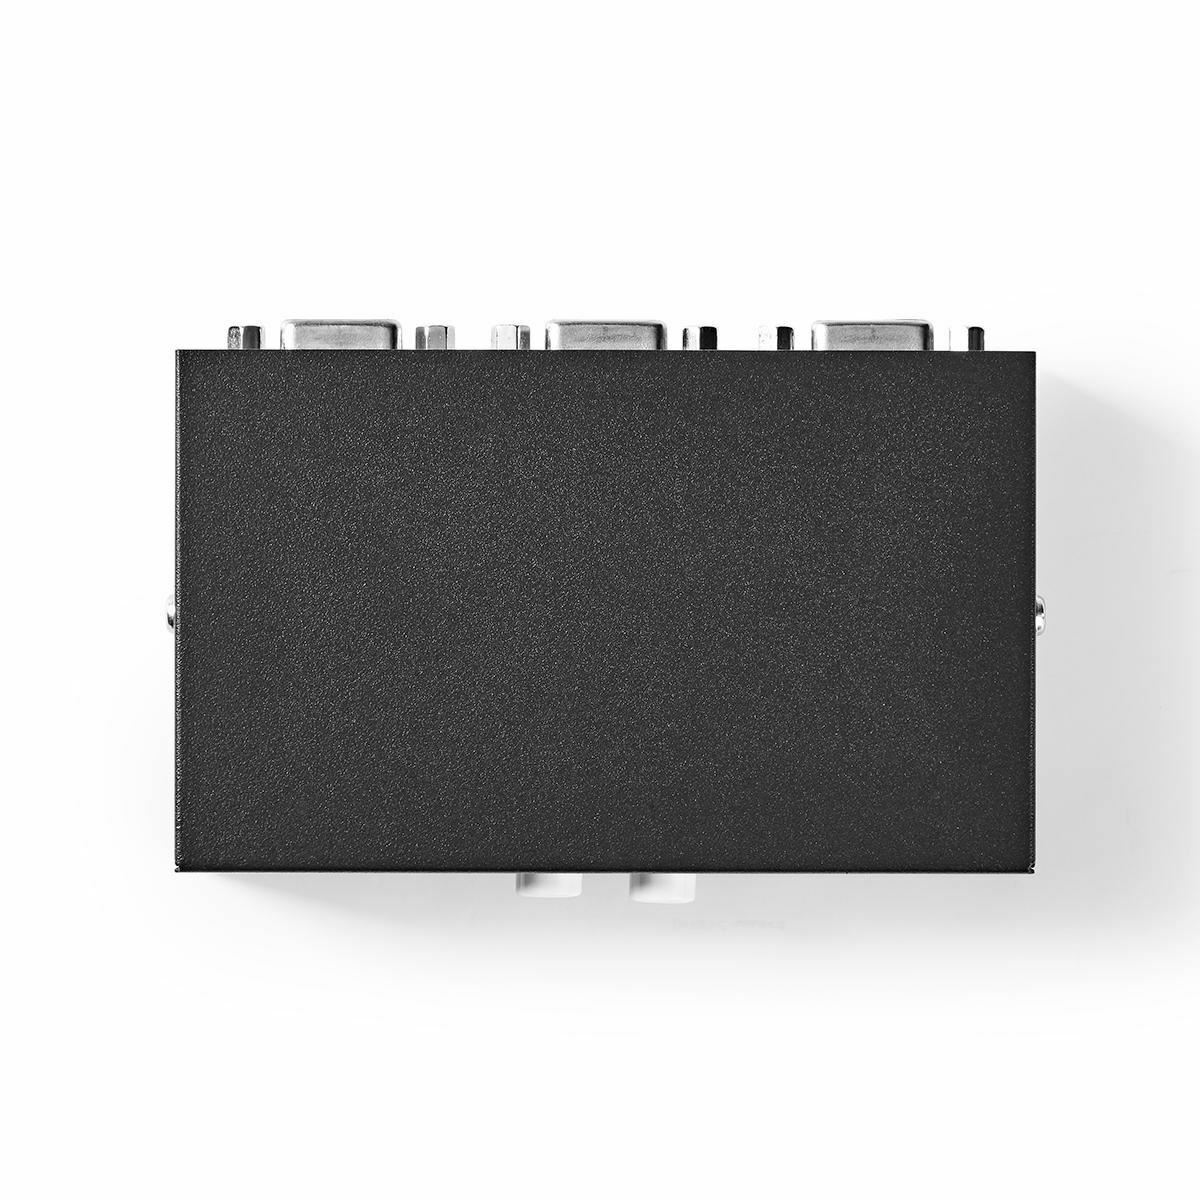 Nedis 2-Port VGA Switch Black